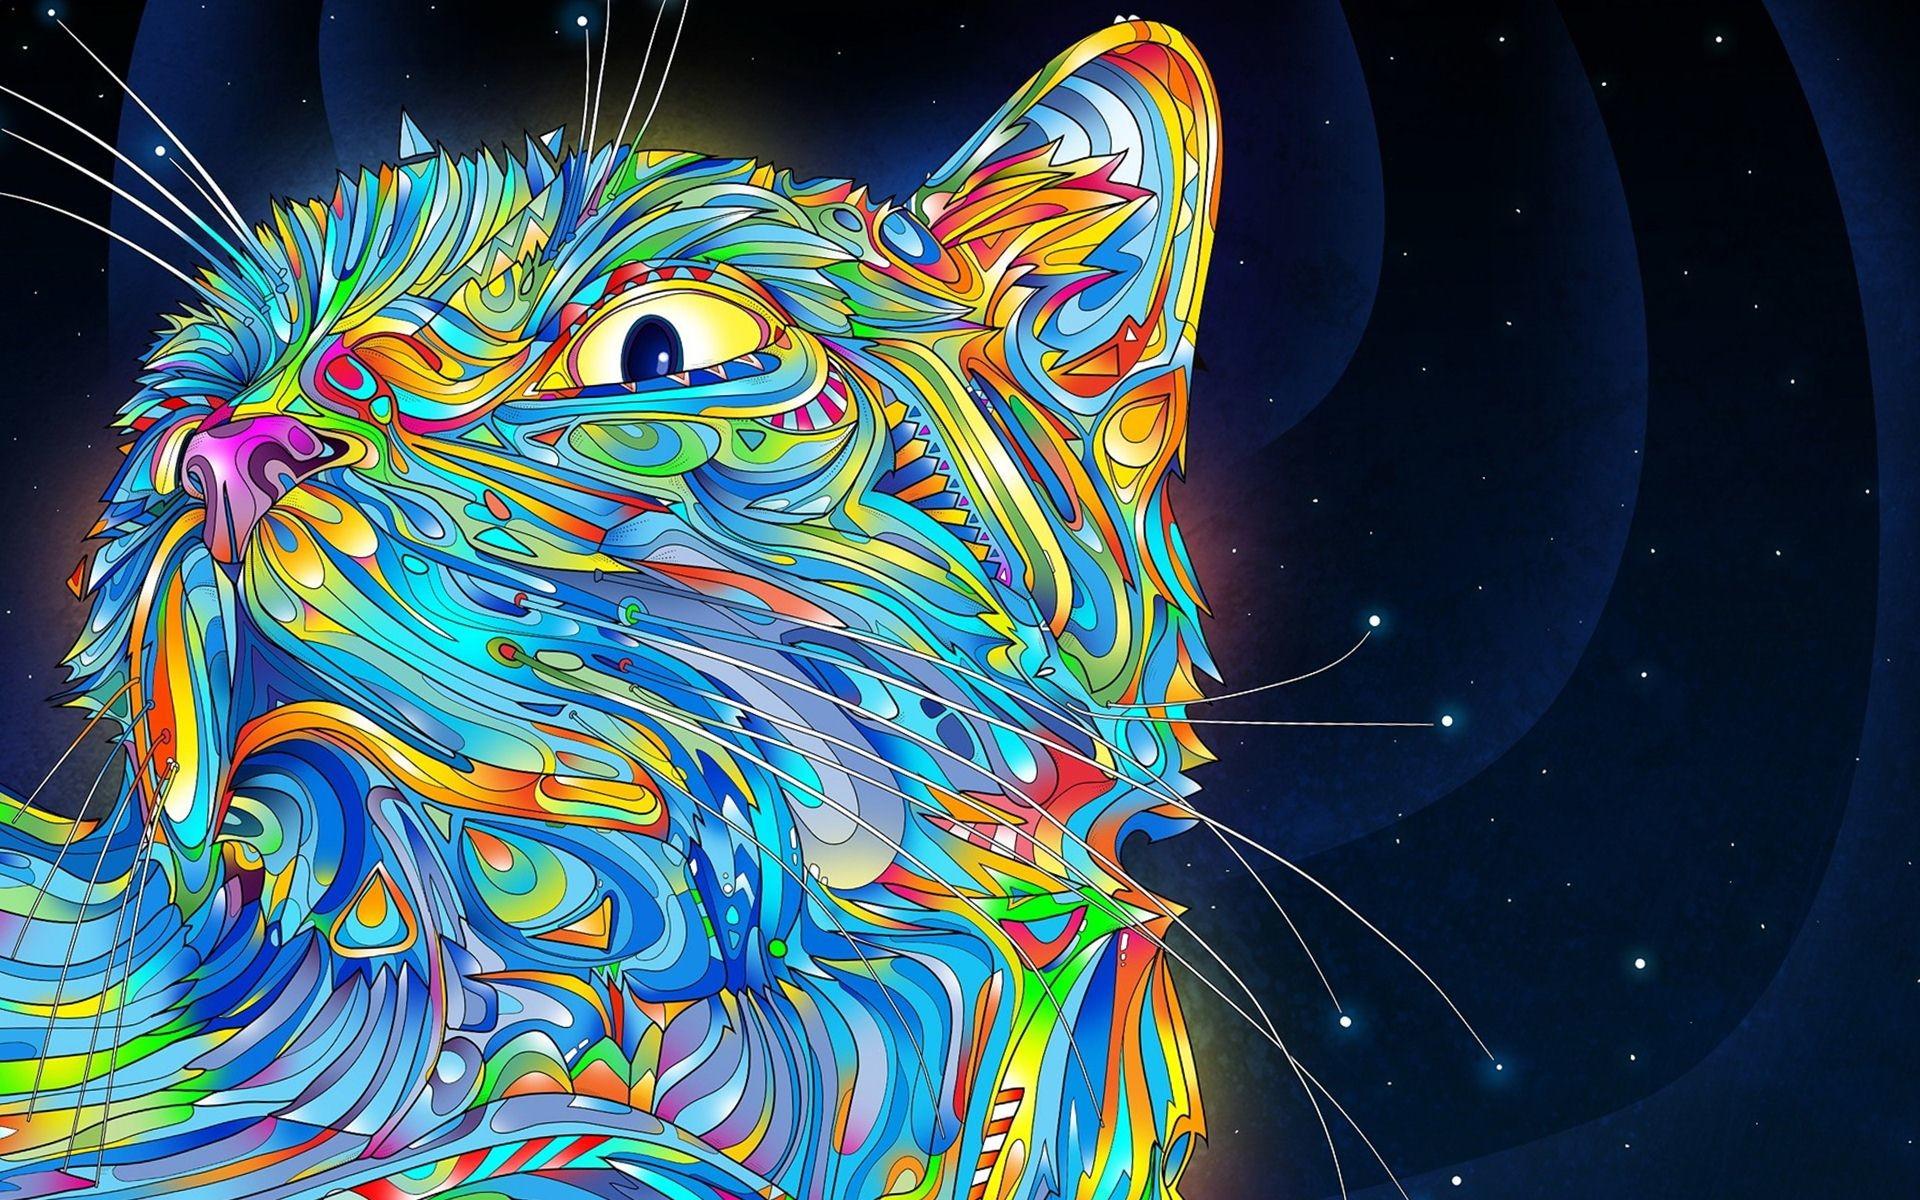 Wonderful Wallpaper Halloween Trippy - 623615  You Should Have_594299.jpg